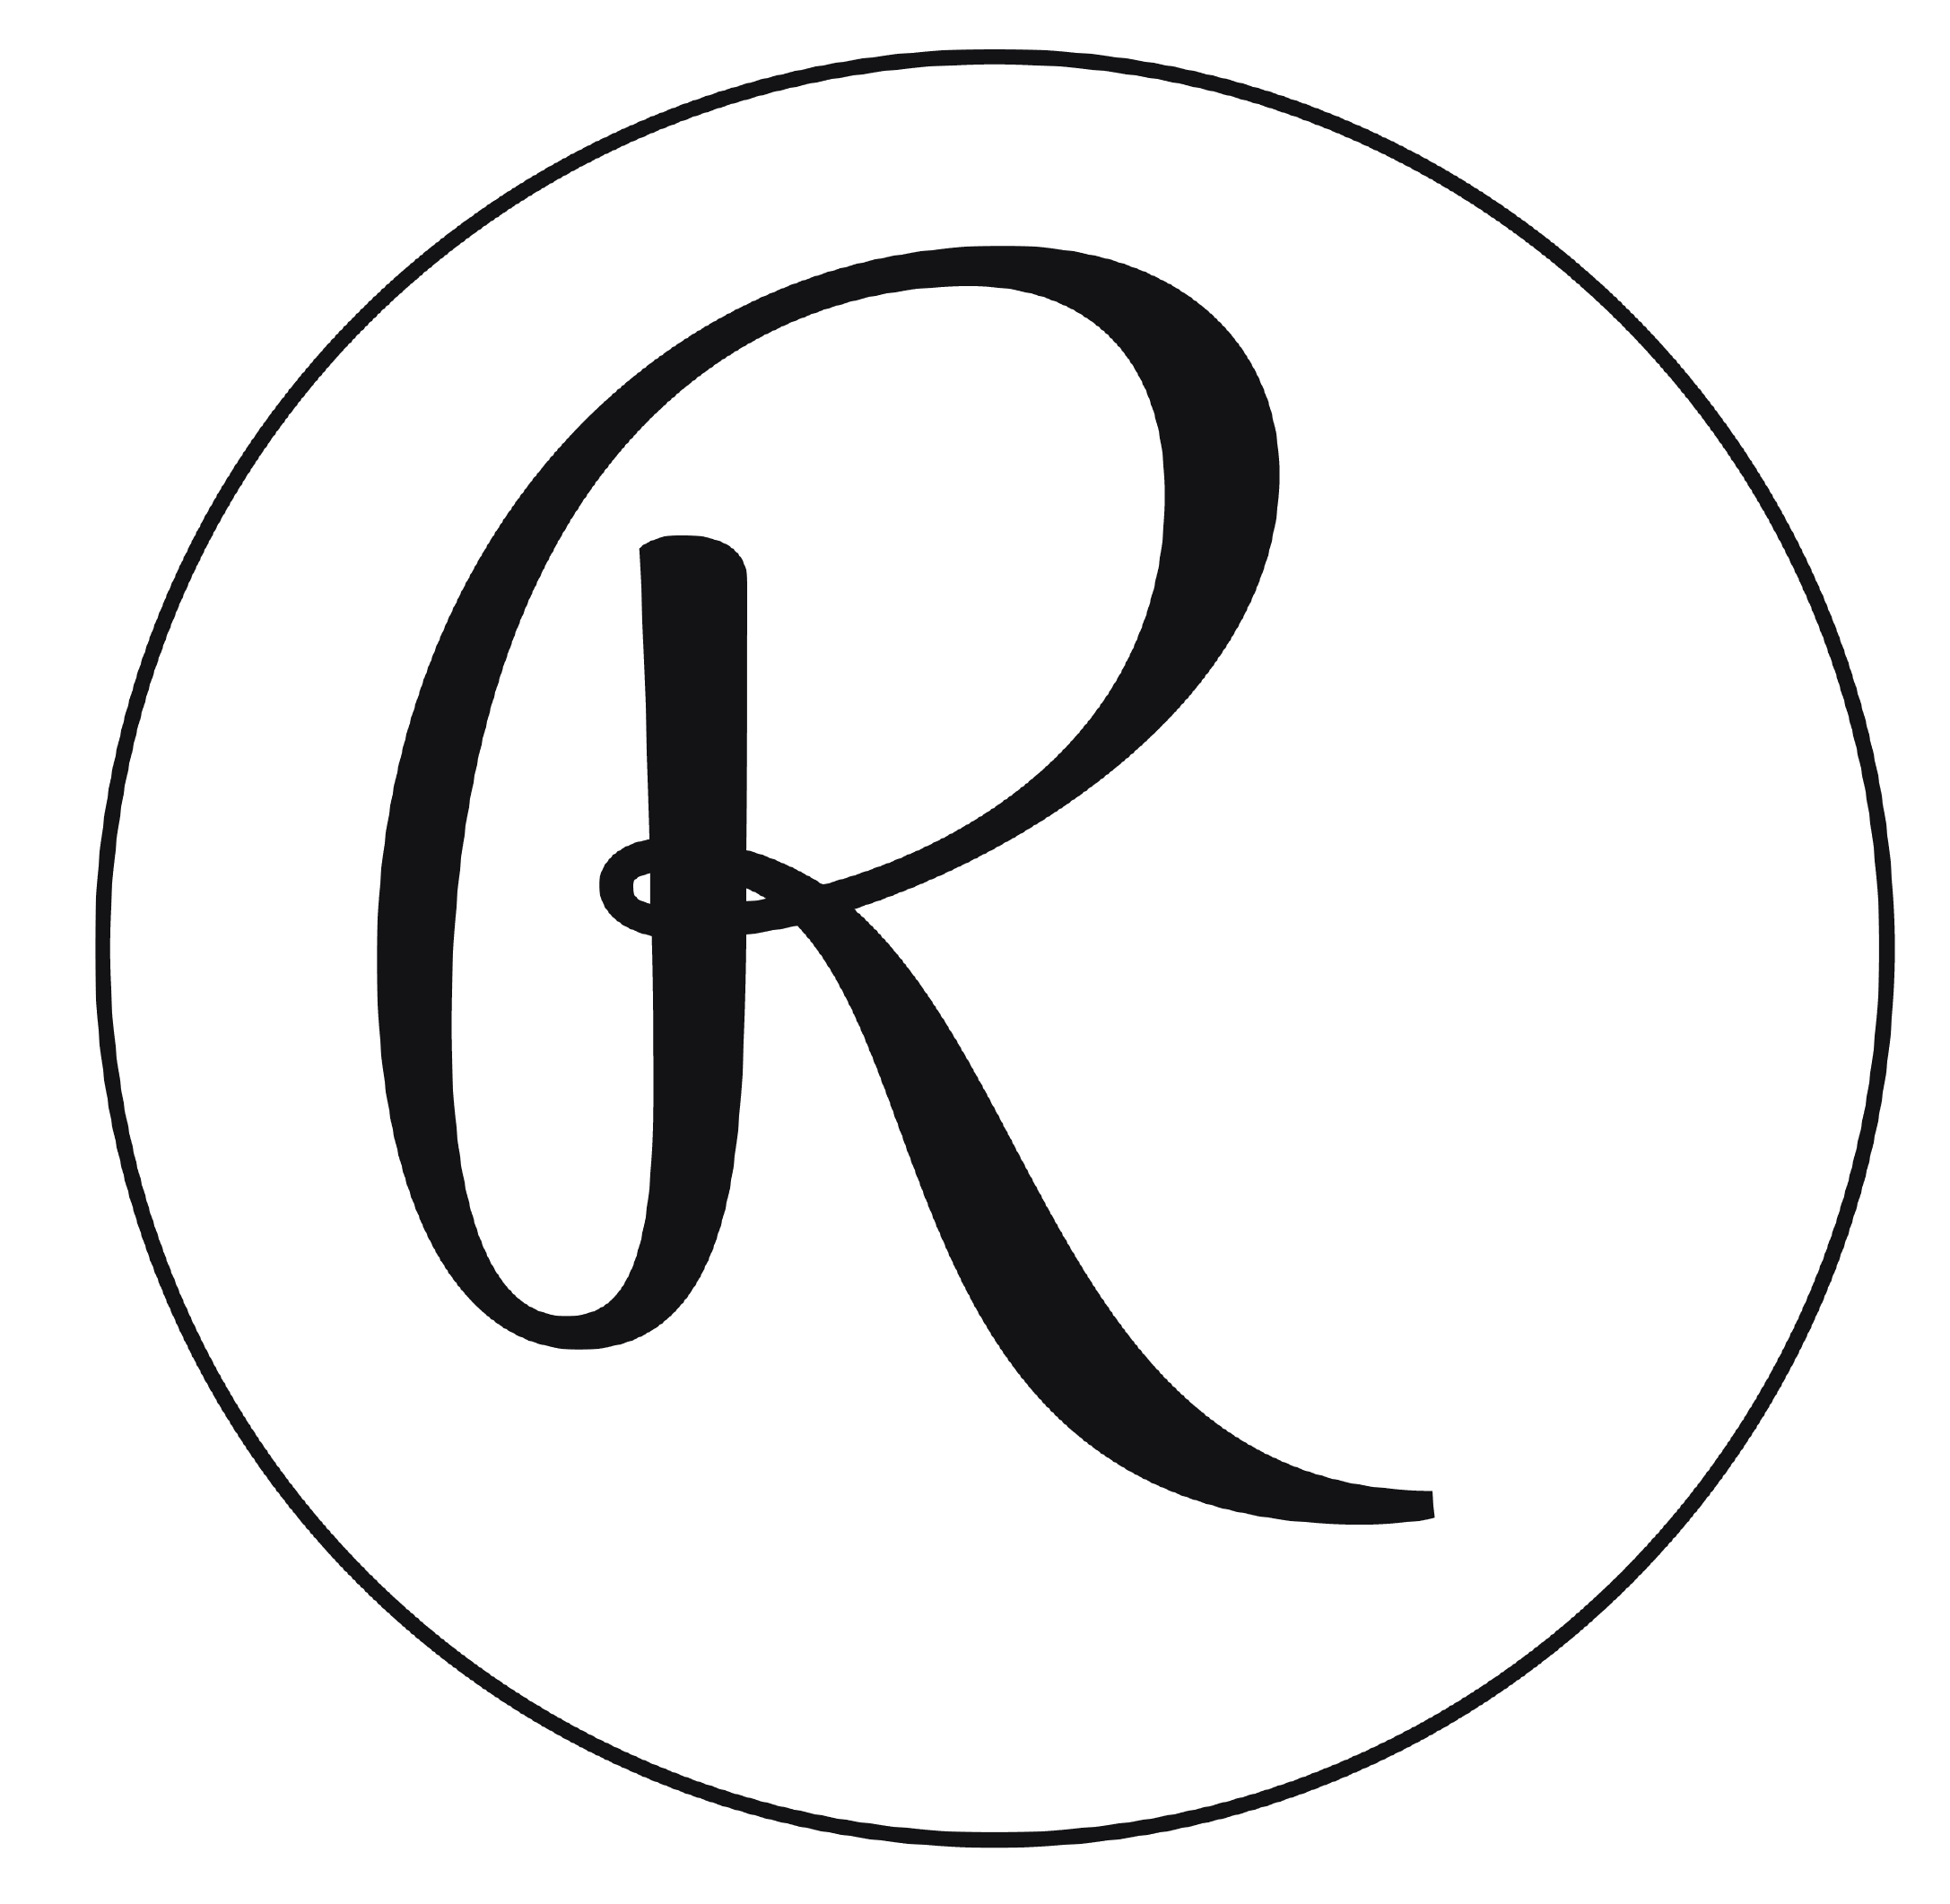 Cafe Roeloffs